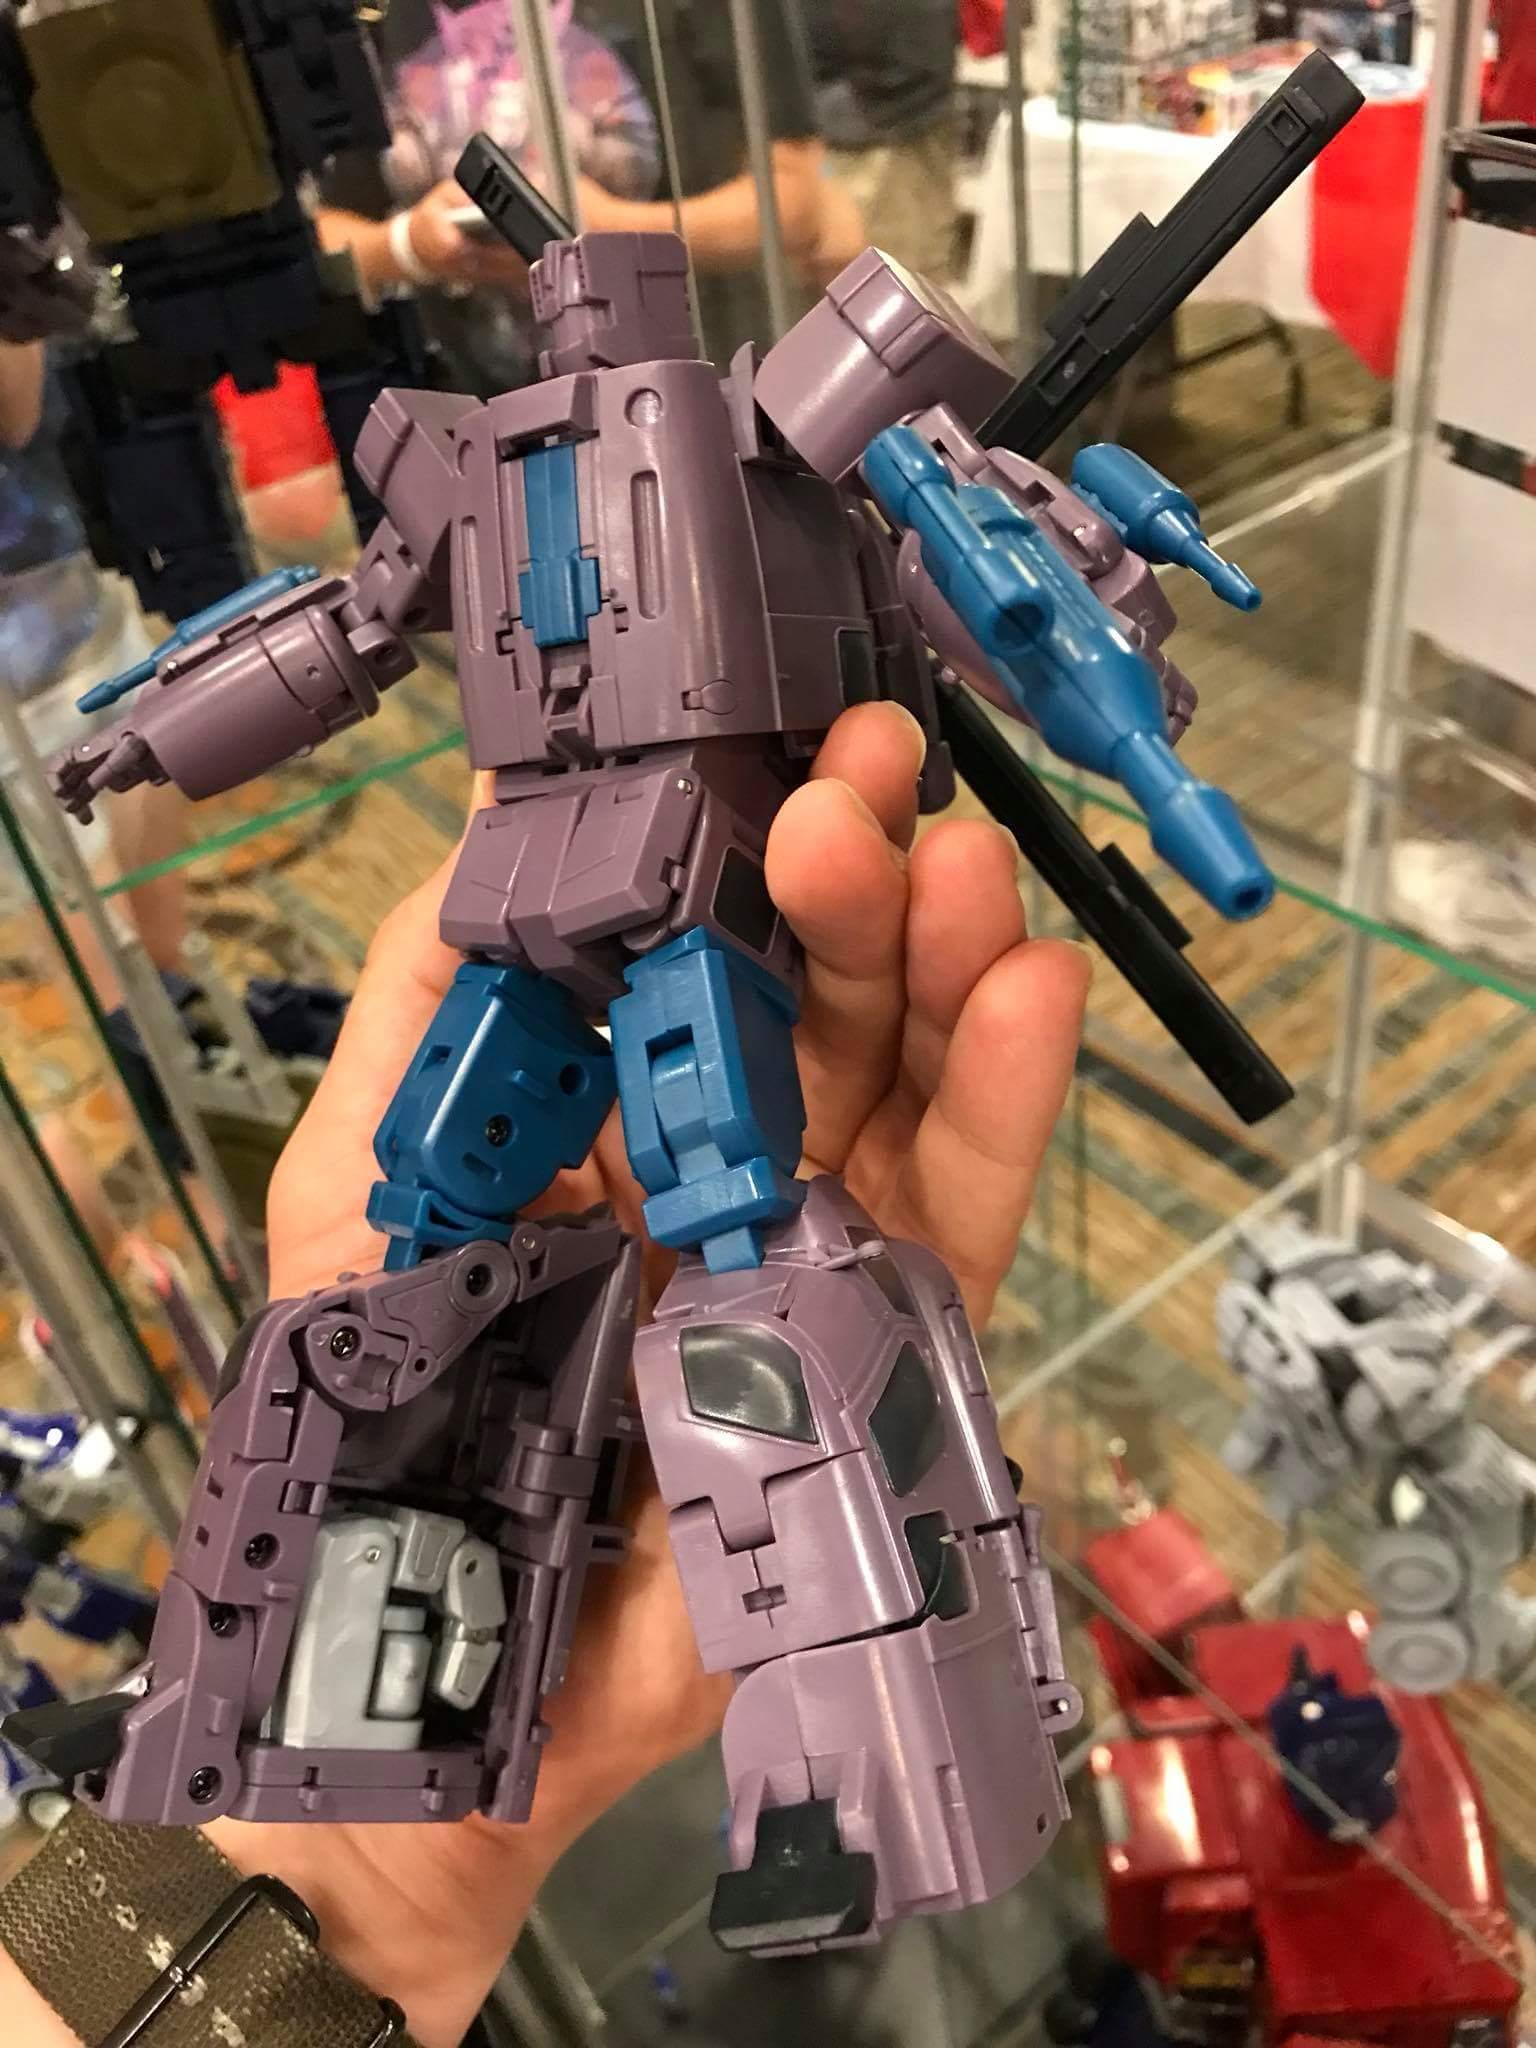 [Ocular Max] Produit Tiers - Jouet Assaultus (PS-13 à PS-17 Assaultus Malitia) - aka Bruticus TUsemqxz_o